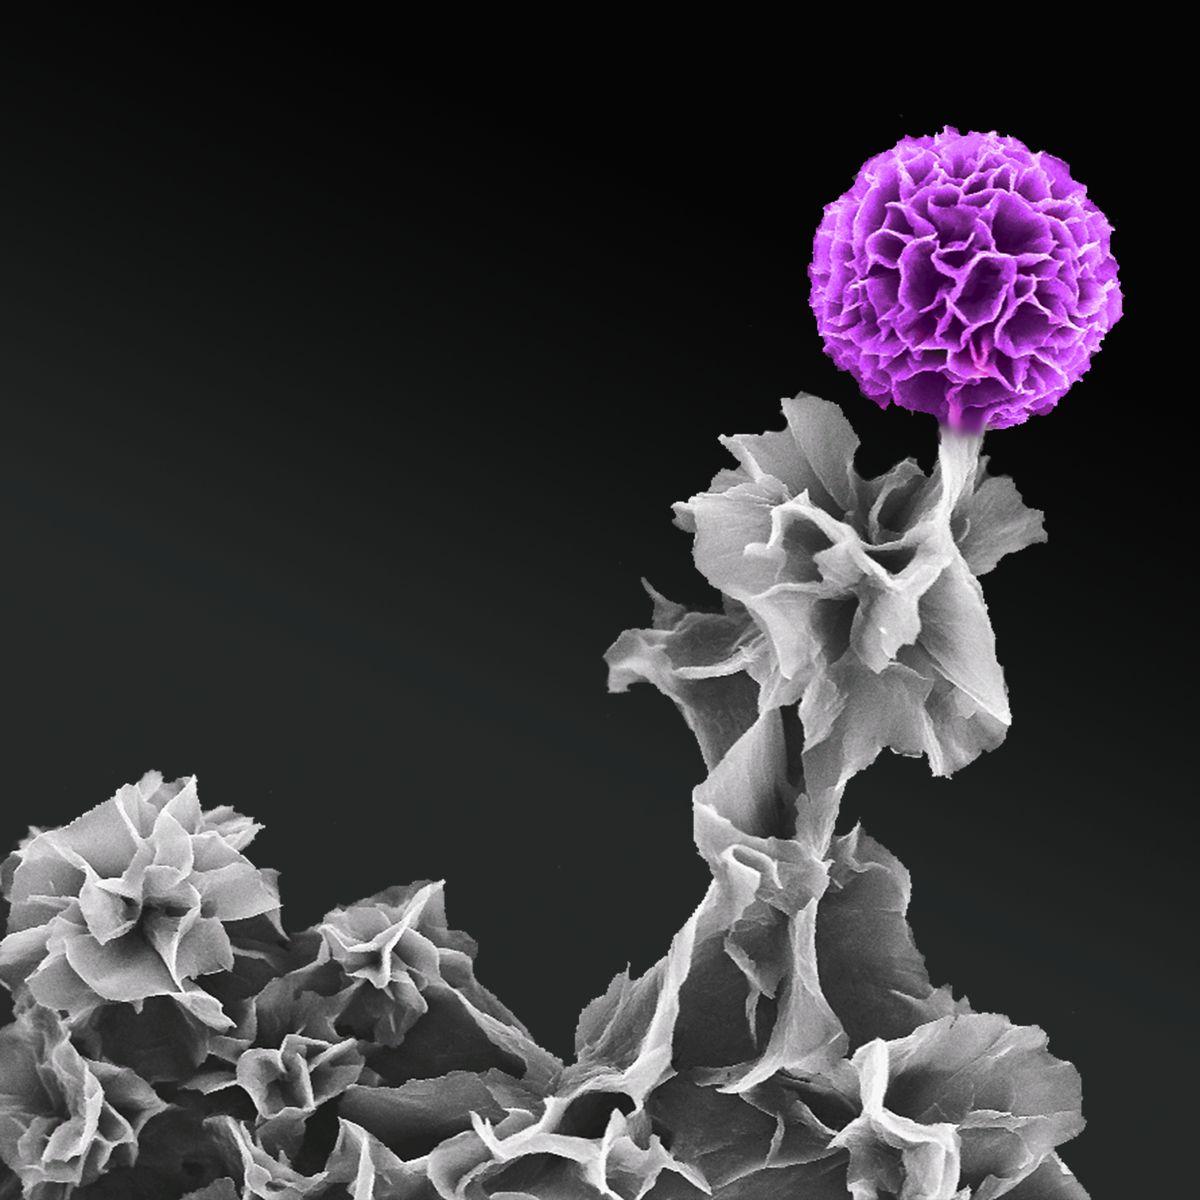 Tetraanaline in full bloom